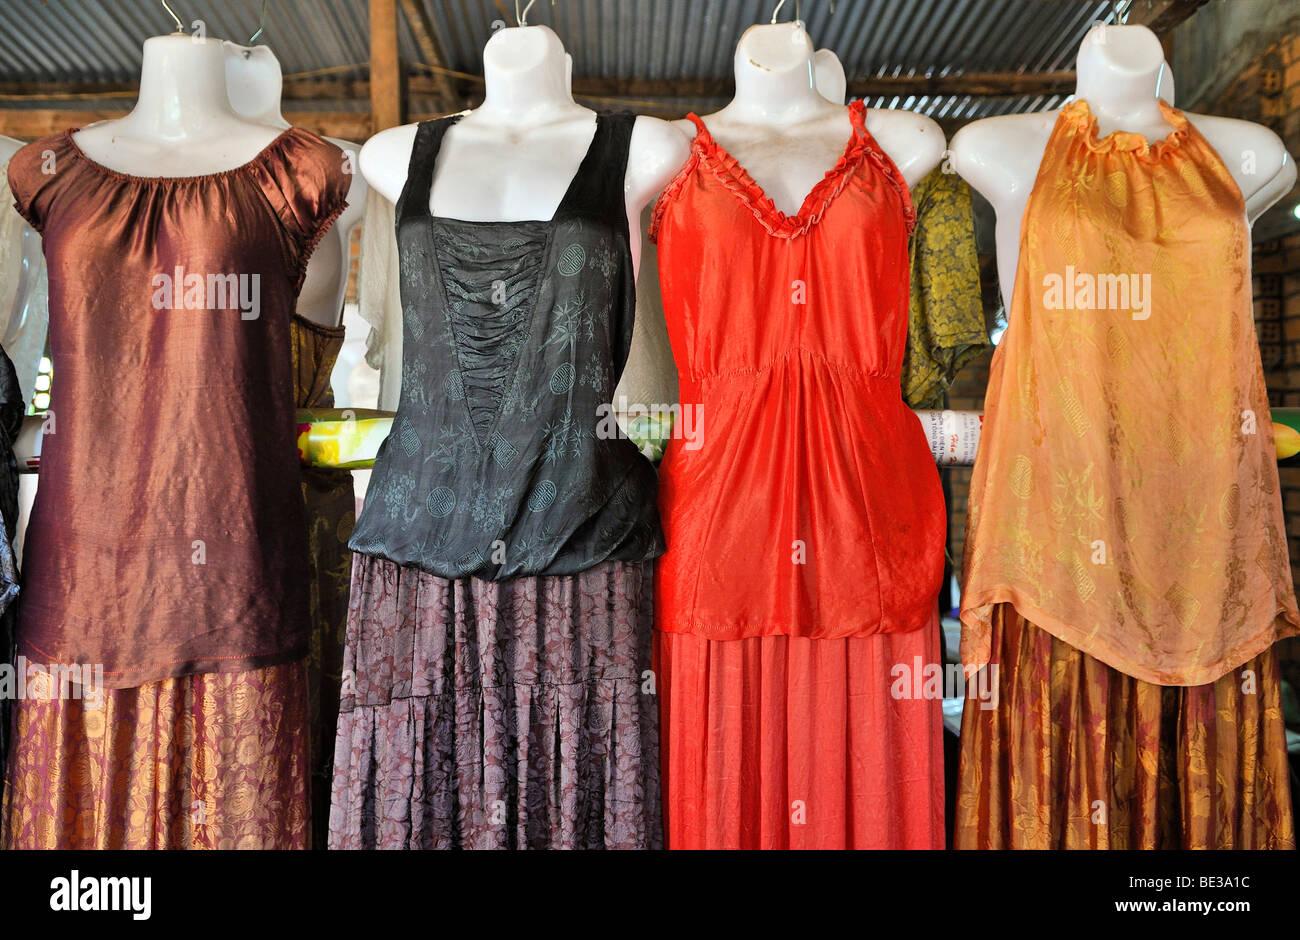 Colorful silk dresses on mannequins, Dalat capital, Central Highlands, Vietnam, Asia - Stock Image